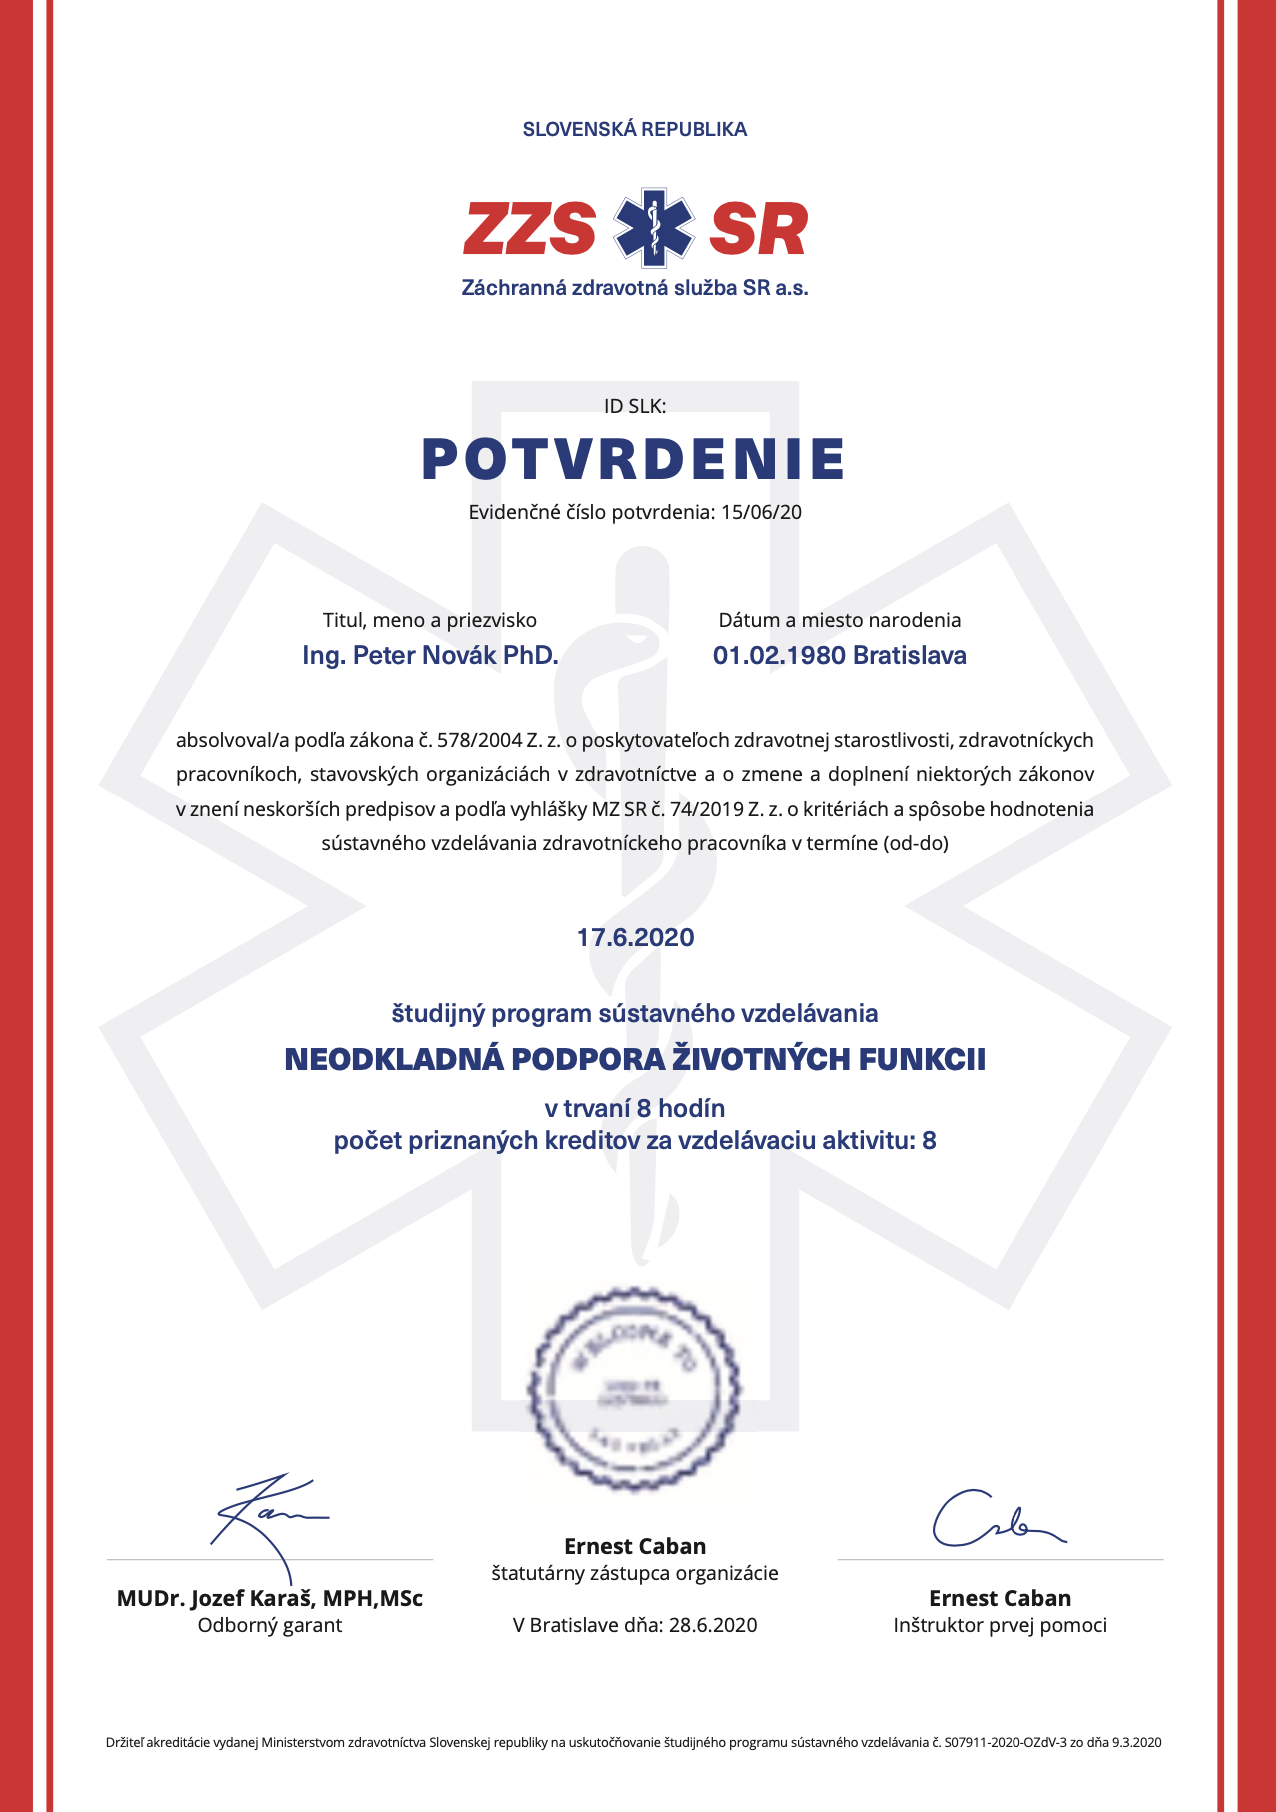 ZZSSR-Certifikat-NPZF